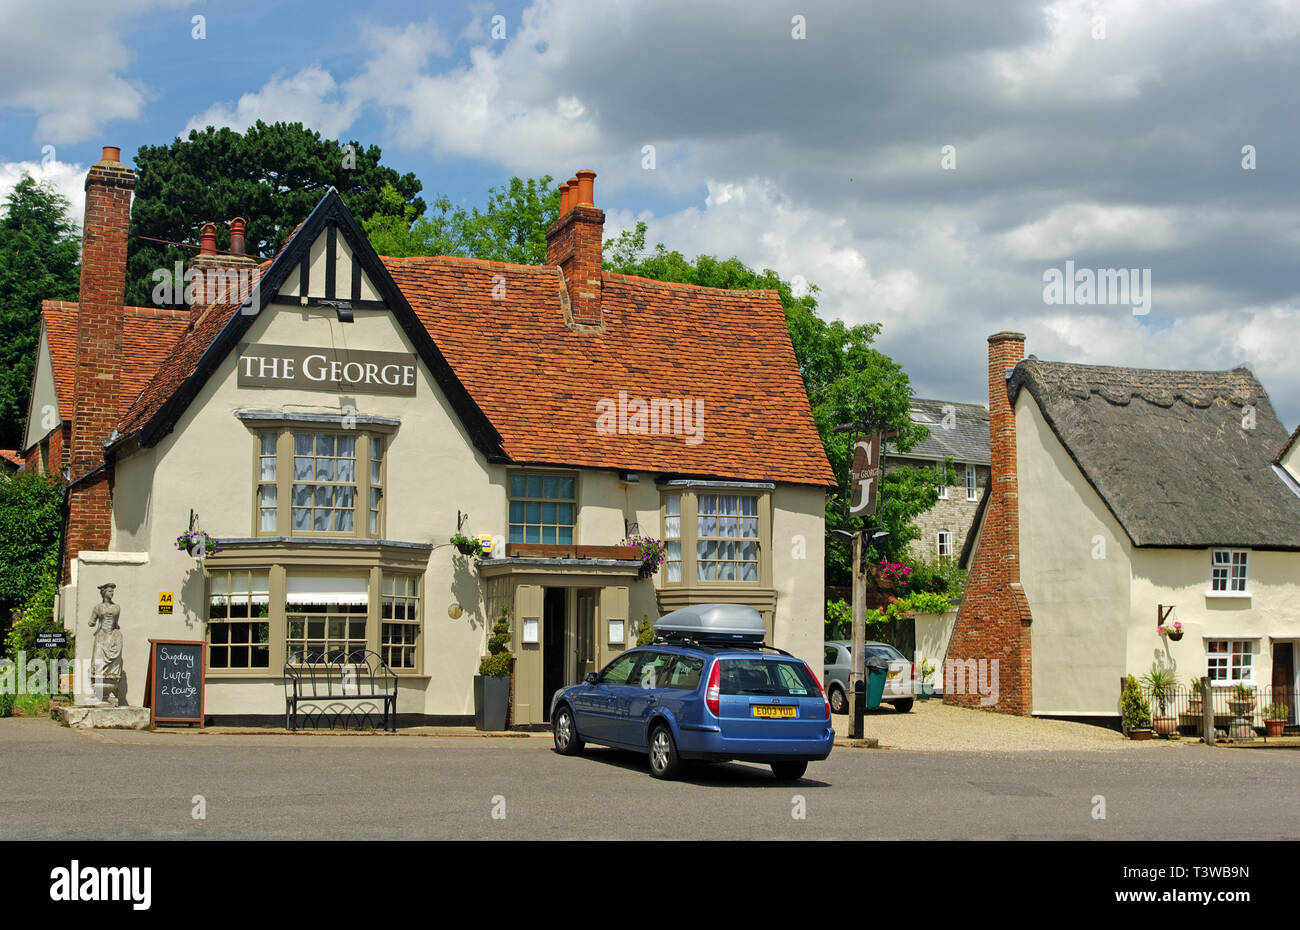 The George Pub, Cavendish, Suffolk - Stock Image